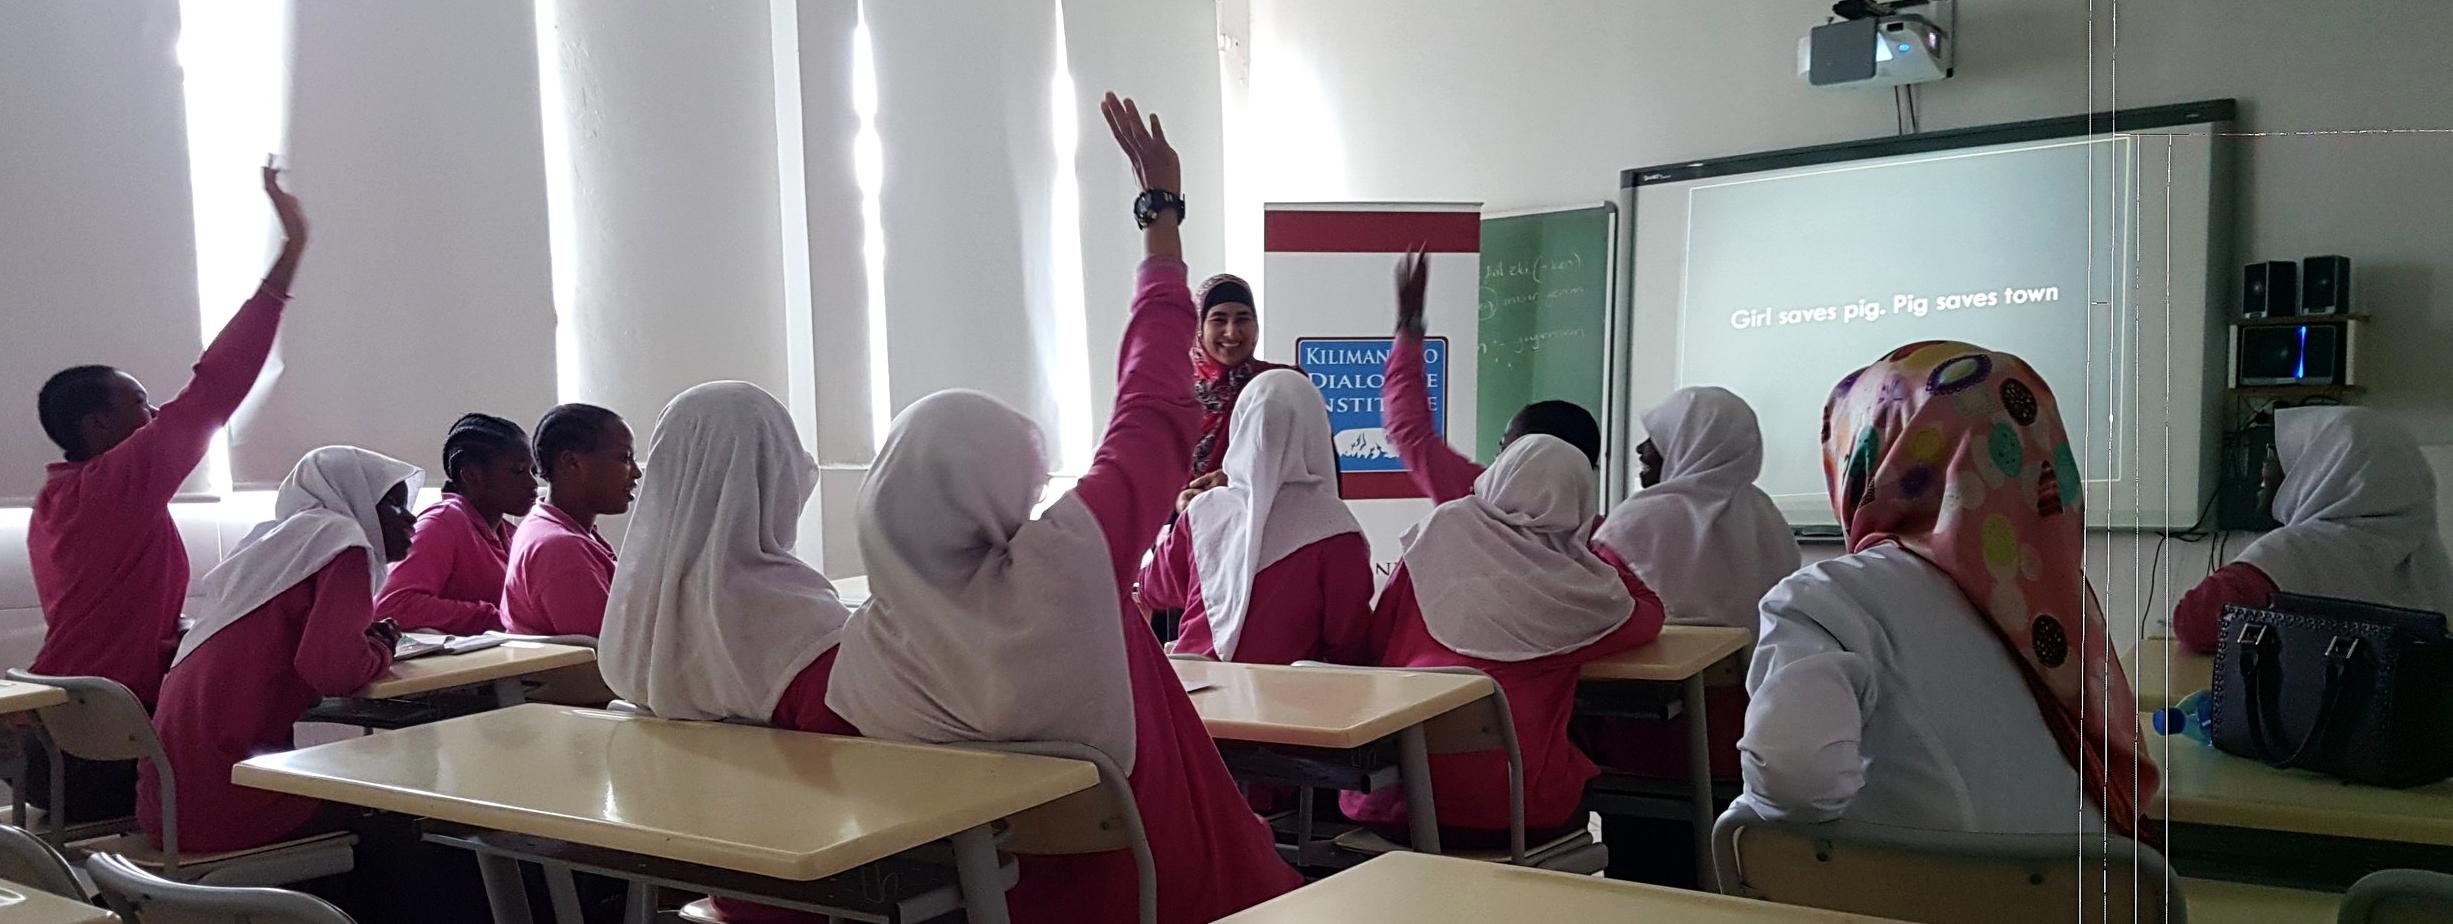 Feza Girls Secondary School - Kawe - May 2018